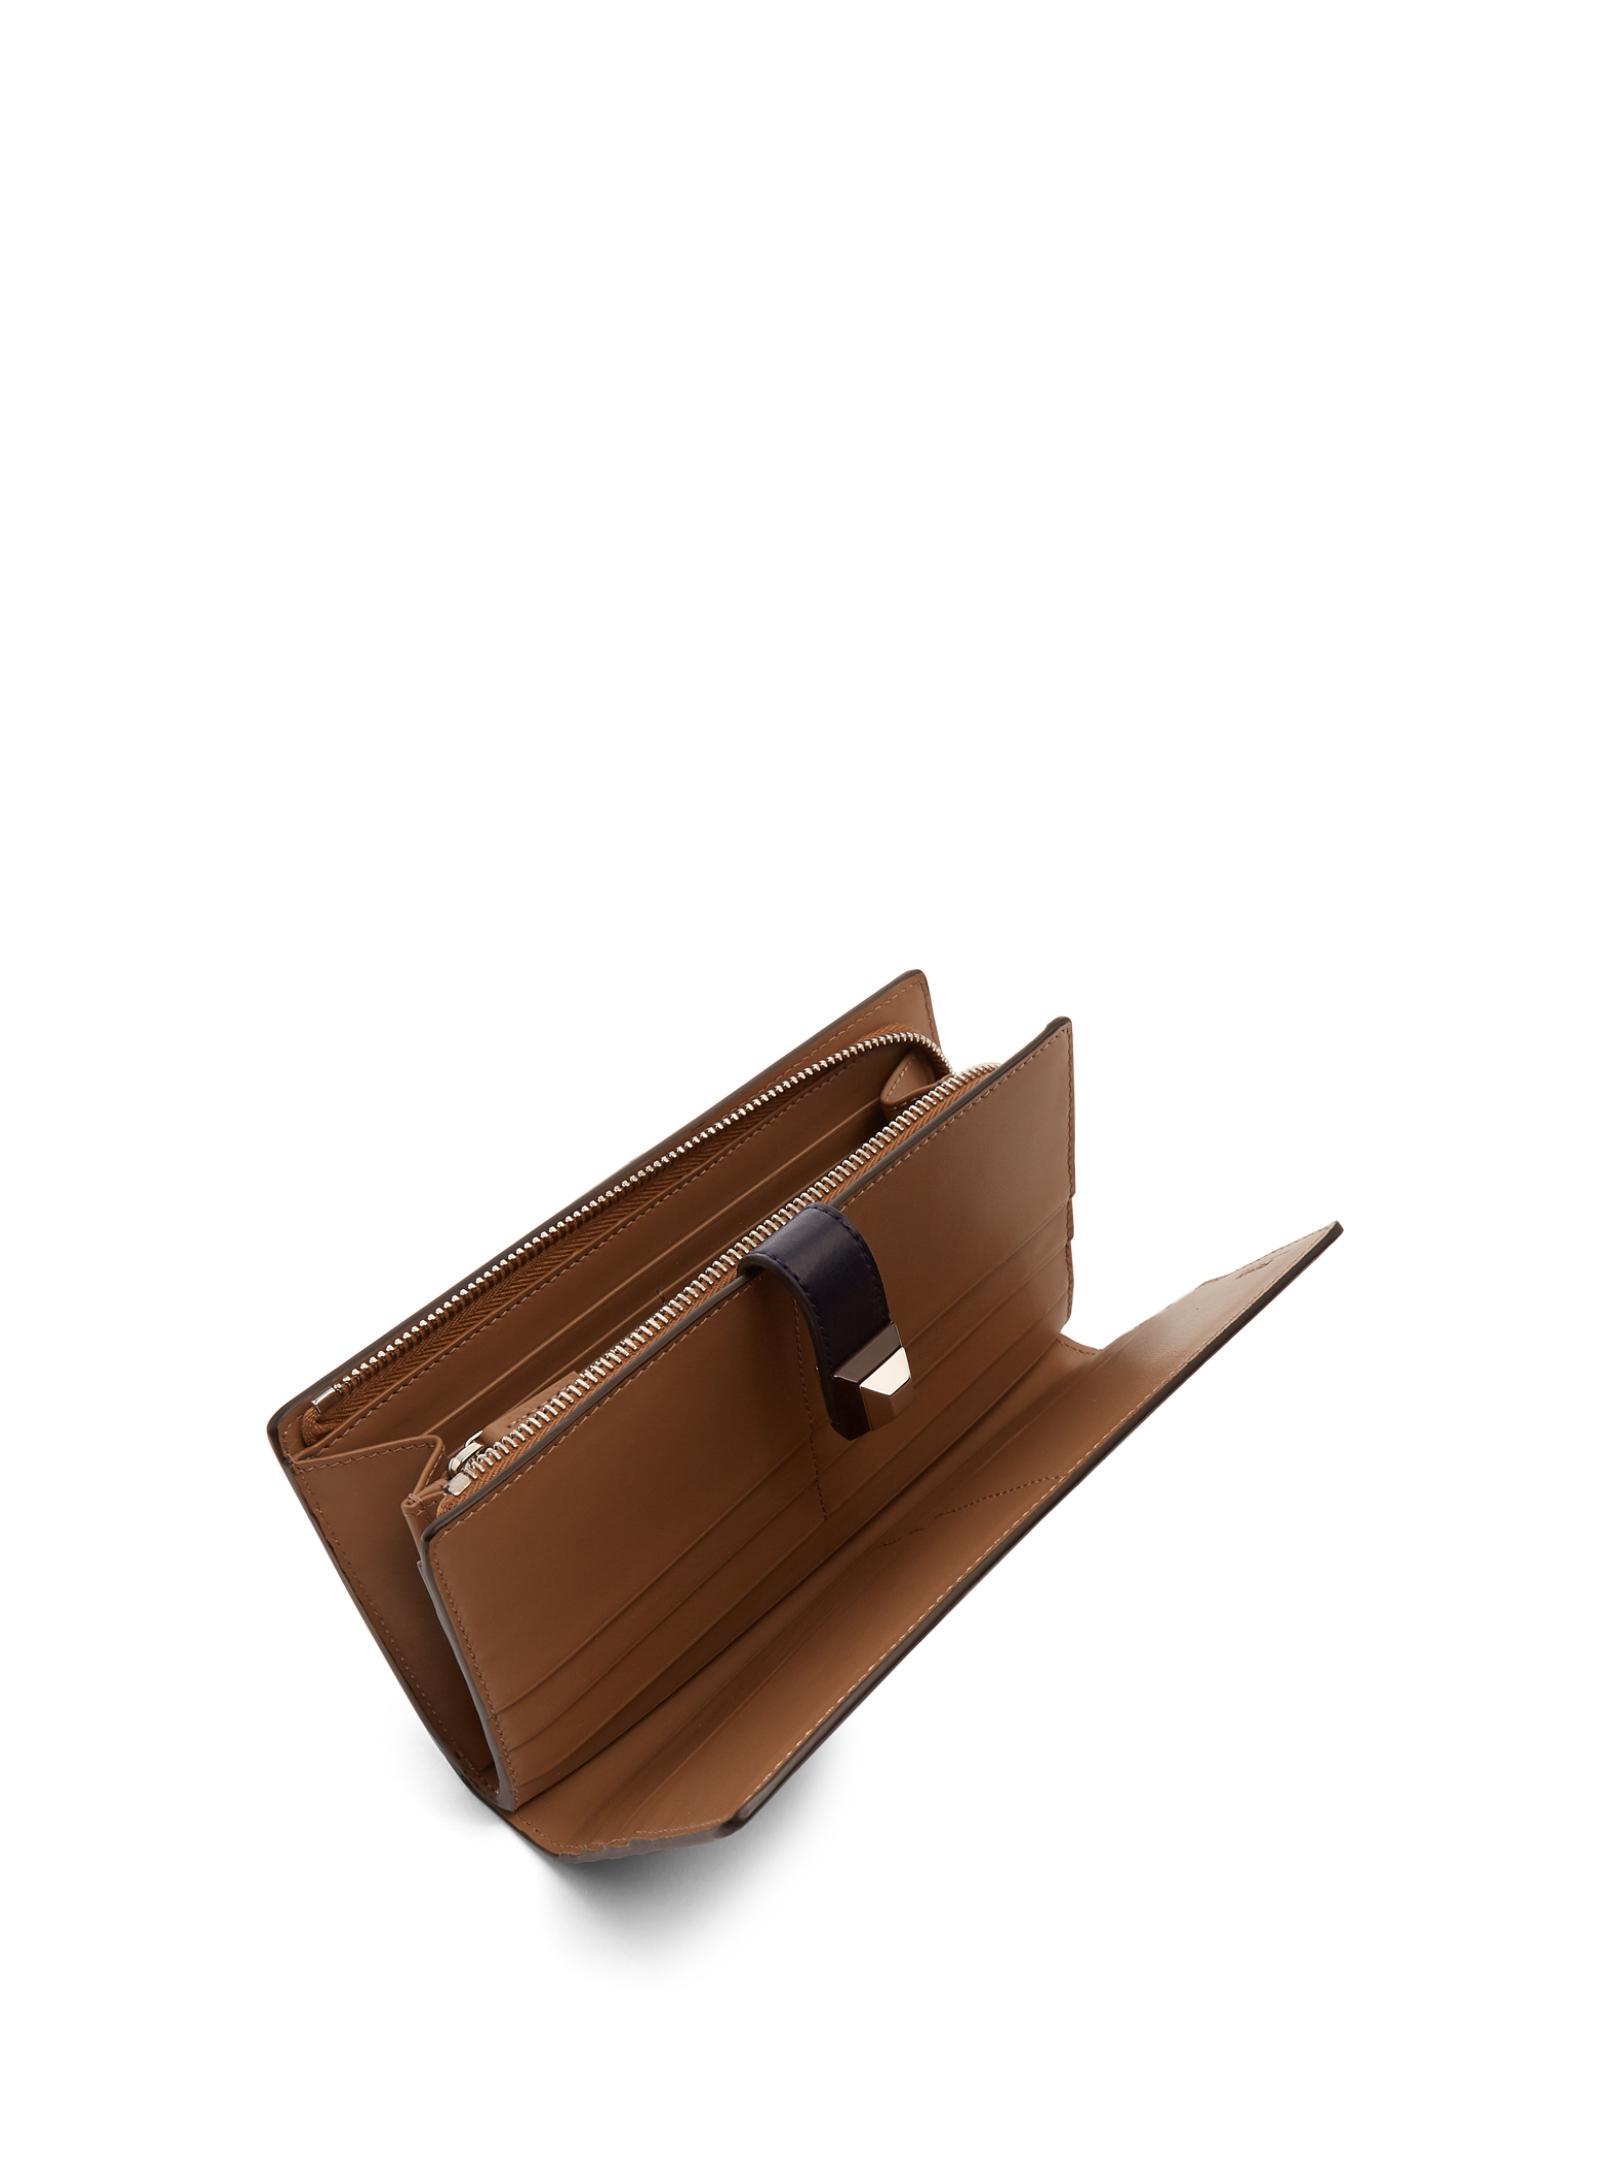 Fendi Travel Wallet